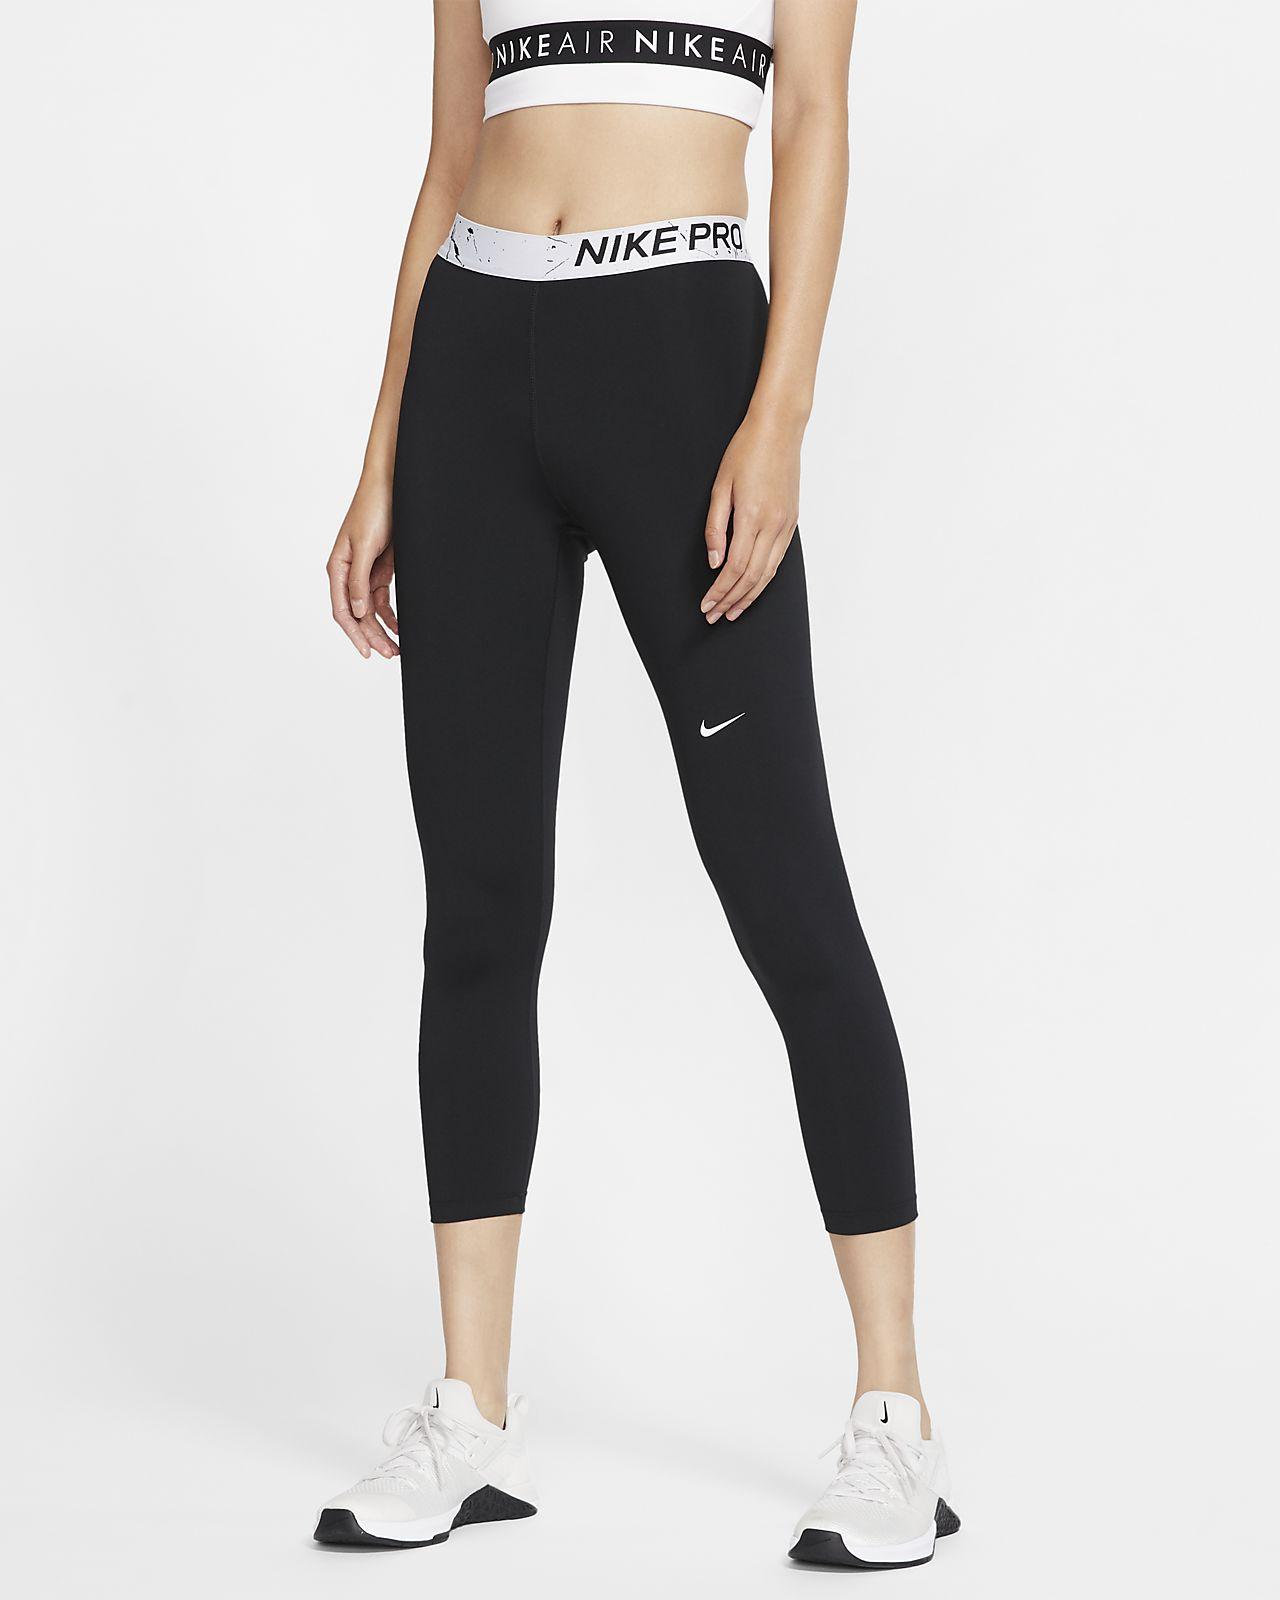 Nike Pro Women's Graphic Capris